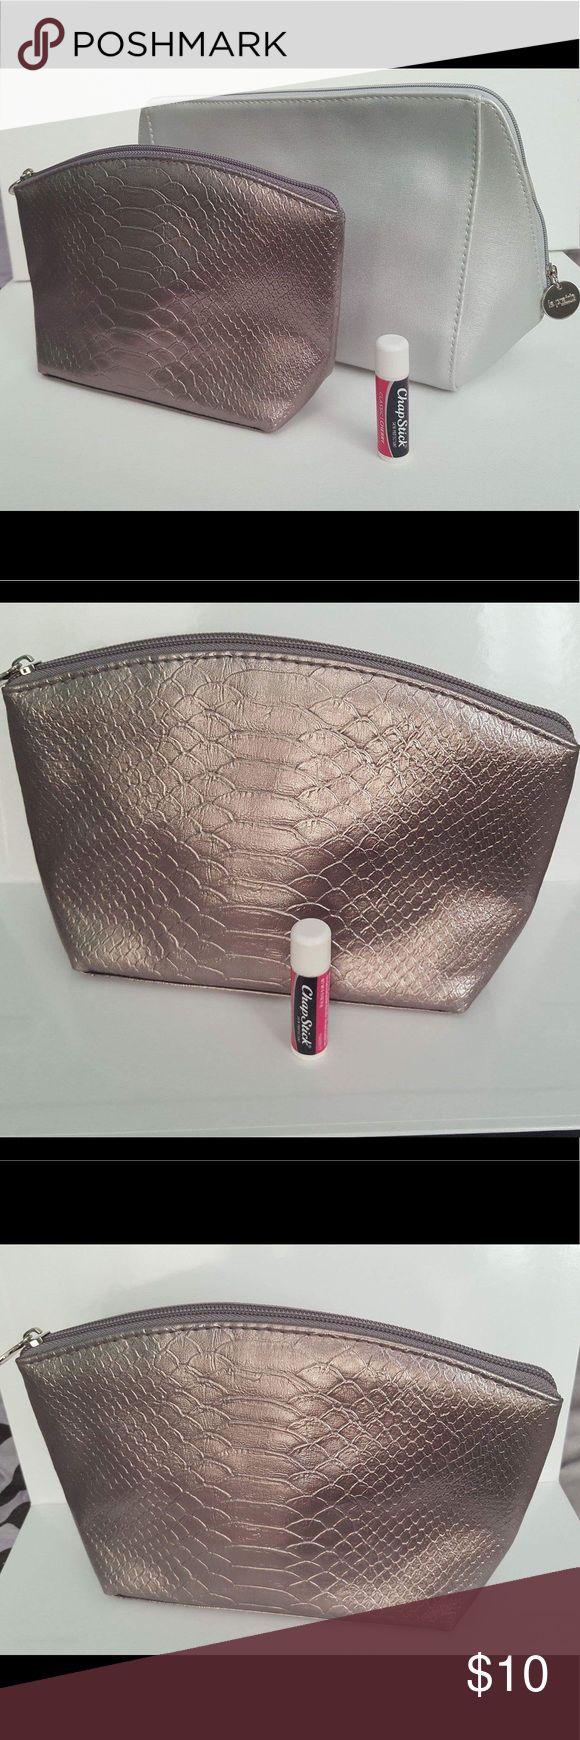 La Prairie new cosmetic/travel makeup Bag/case Makeup